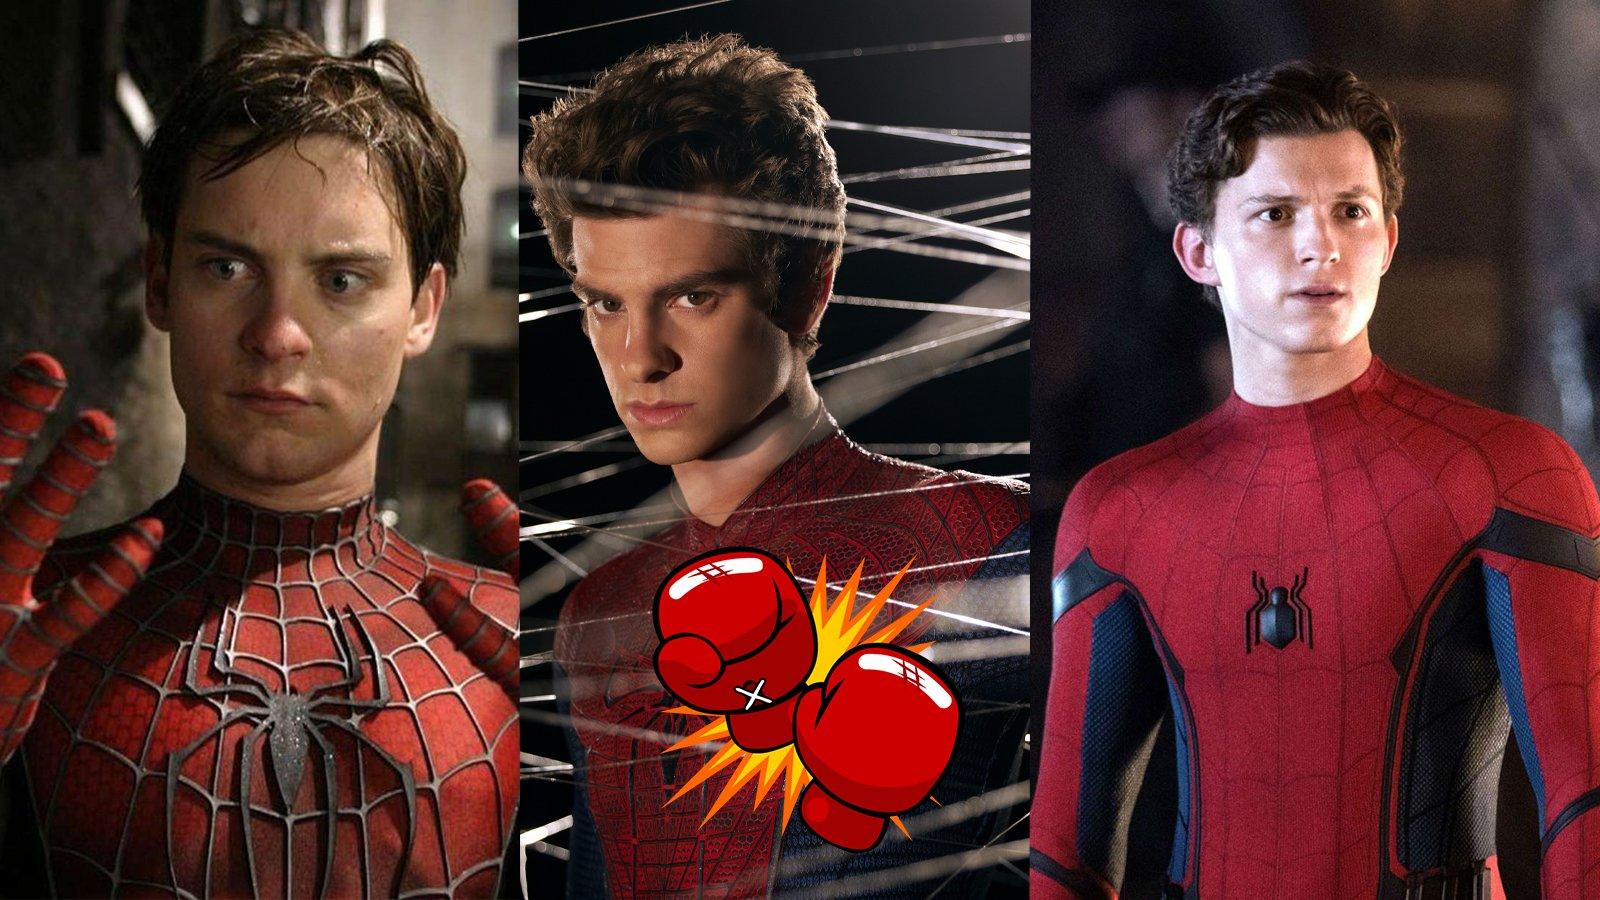 Film Fight Tobey Maguire Andrew Garfield Tom Holland Funniest Spider-Man